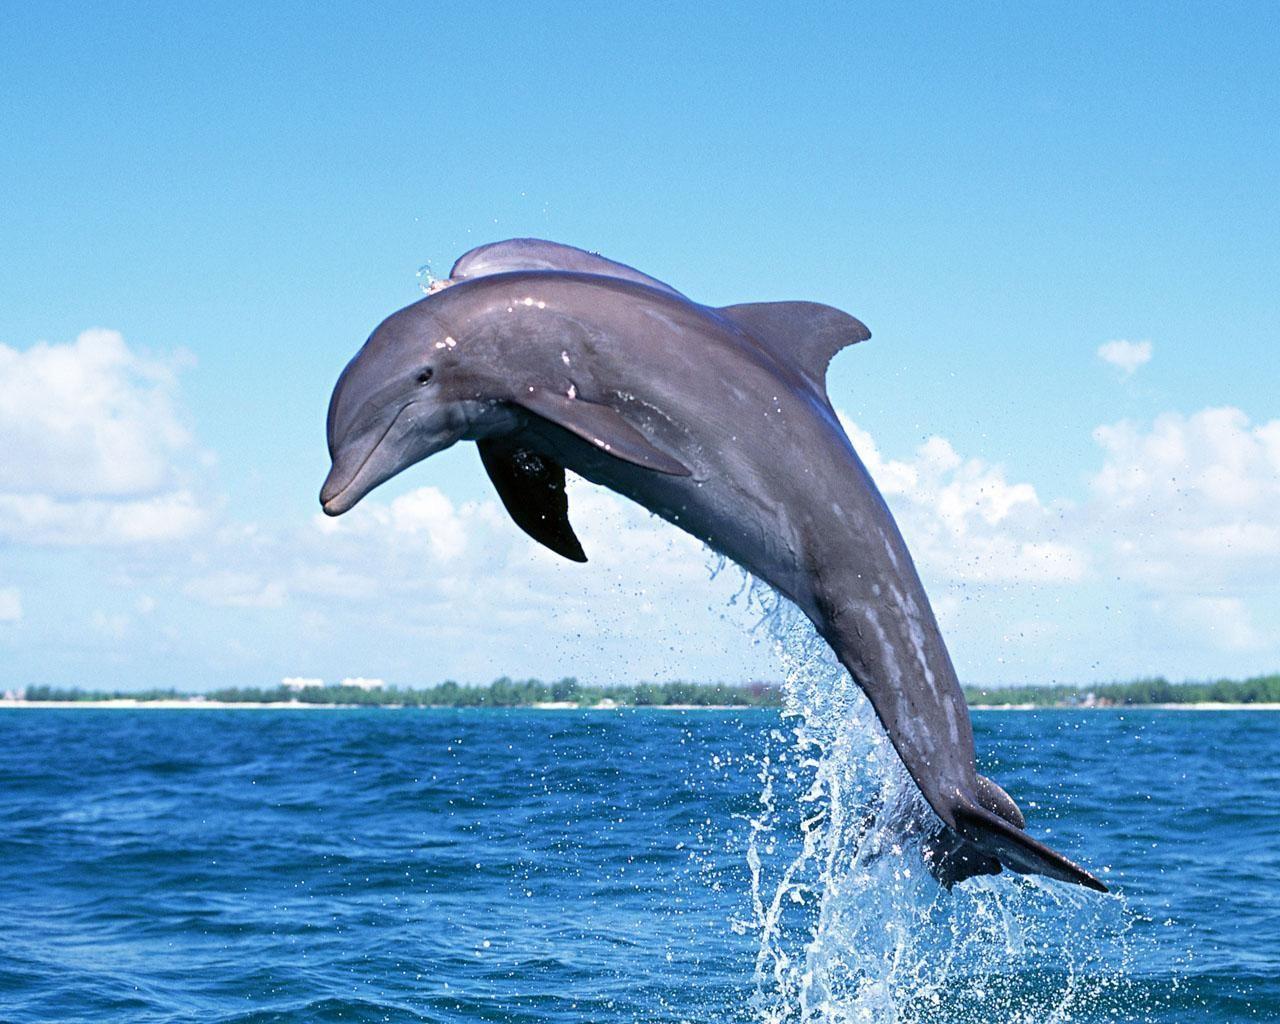 Dolphins Backgrounds download in digitalimagemakerworldcom 1280x1024